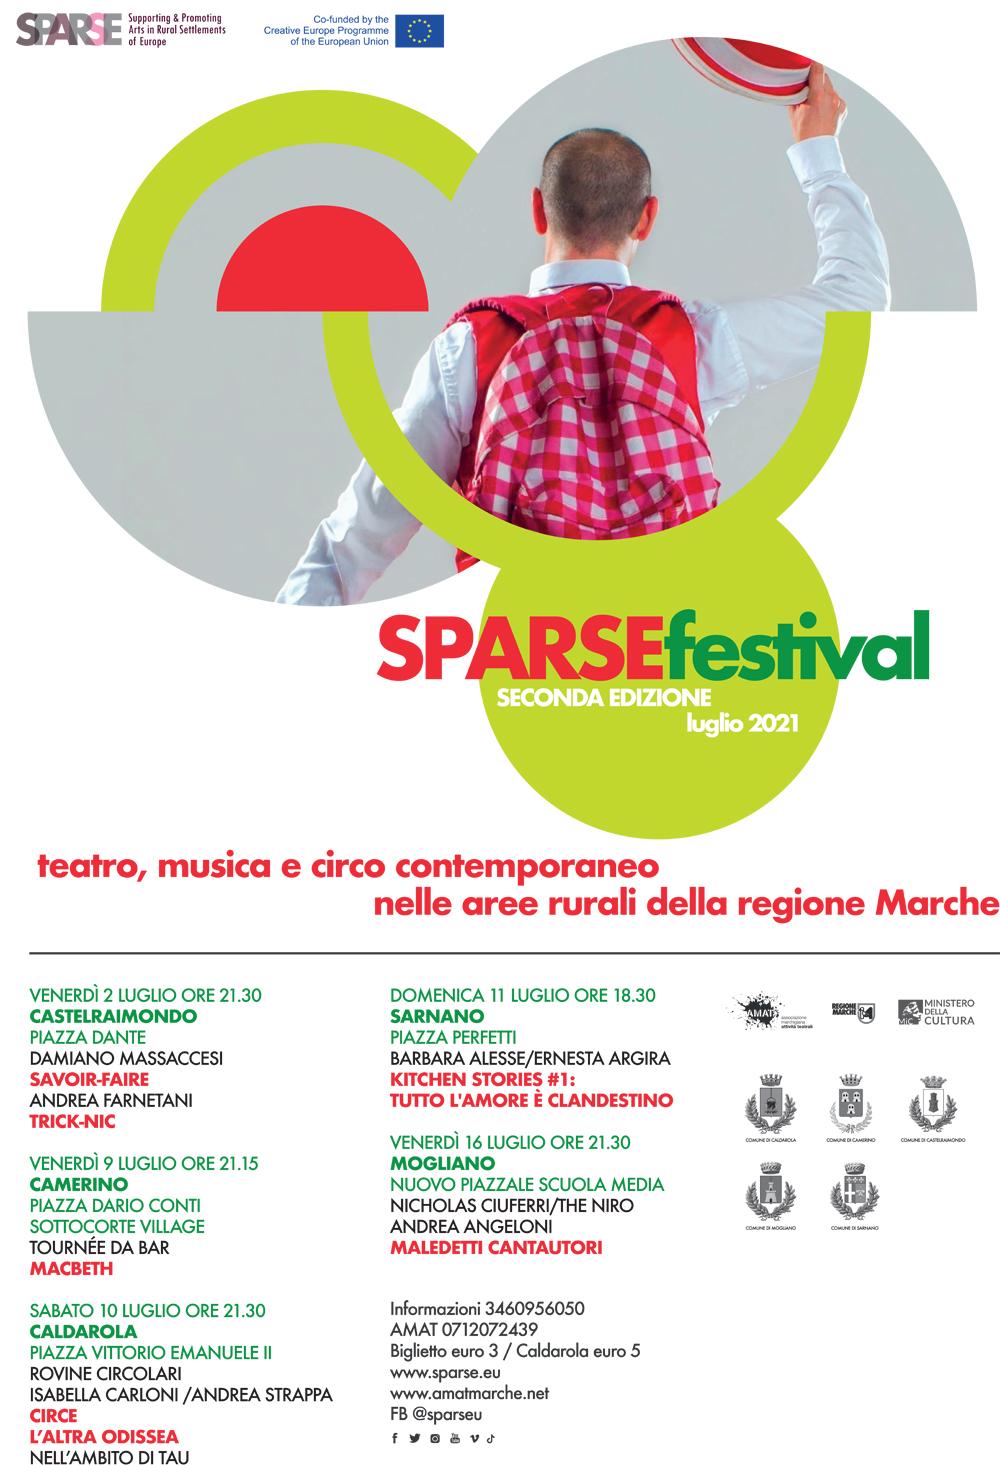 SPARSE FESTIVAL 2021